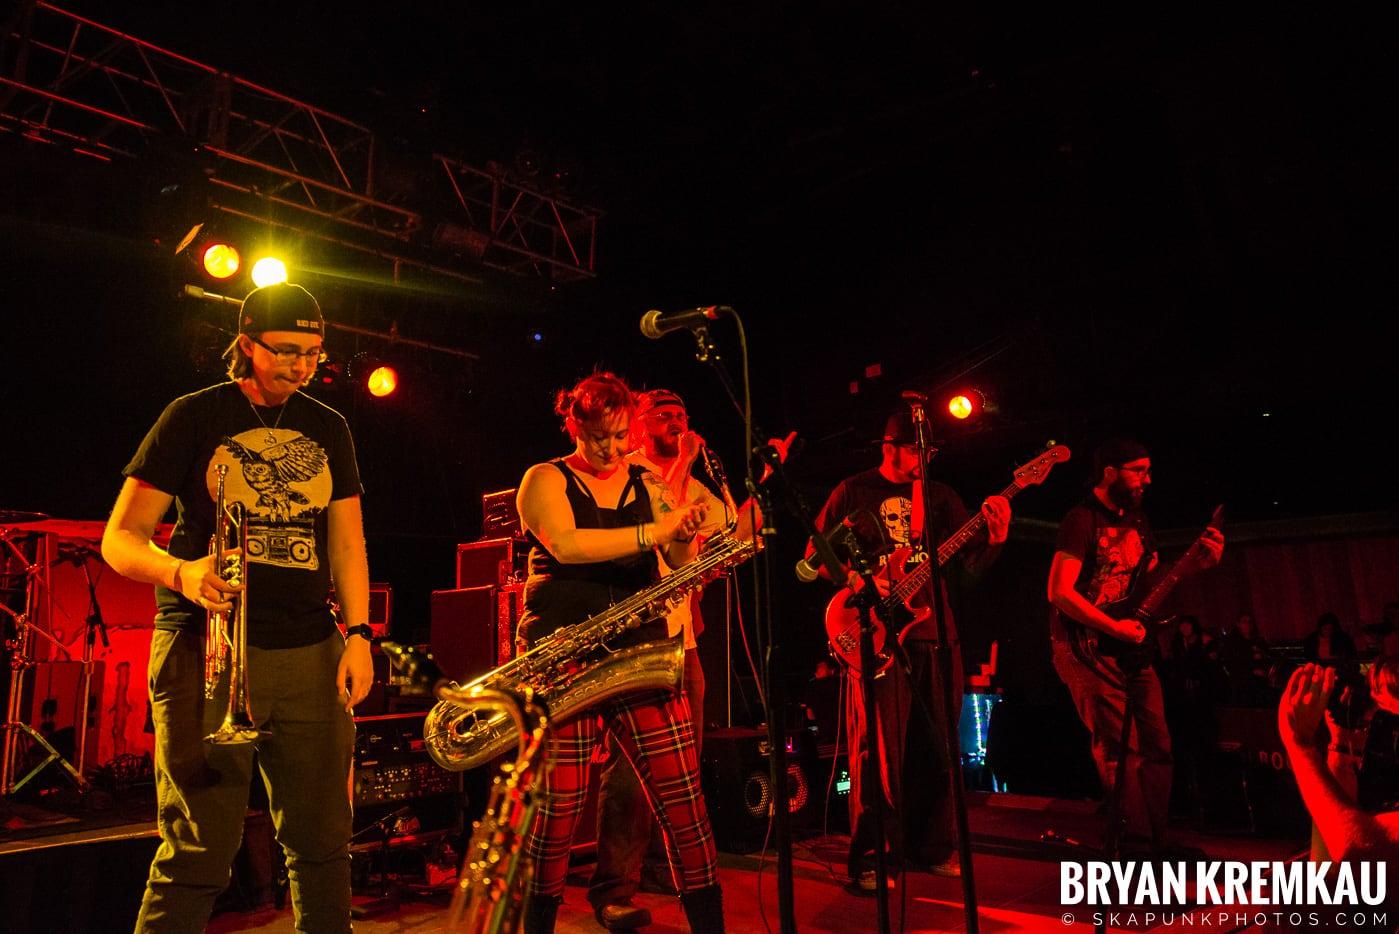 Backyard Superheroes @ Starland Ballroom, Sayreville, NJ - 11.23.18 (6)